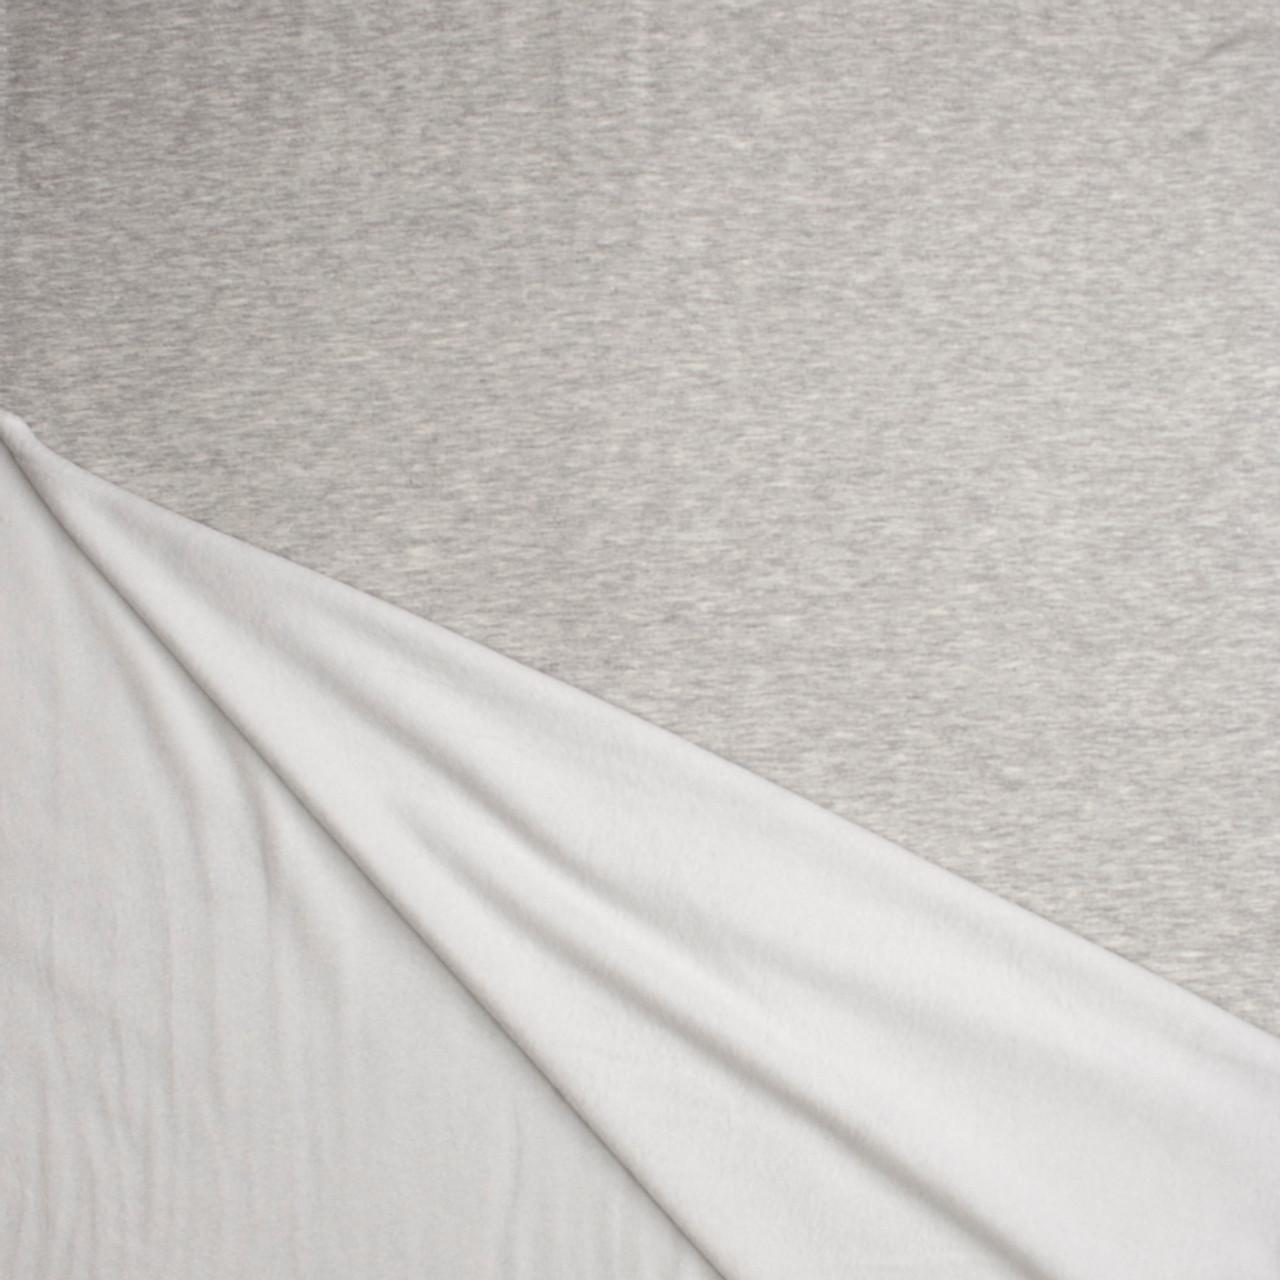 8369d8187b2 ... Light Grey Heather Light Midweight Stretch Sweatshirt Fleece Fabric By  The Yard - Wide shot